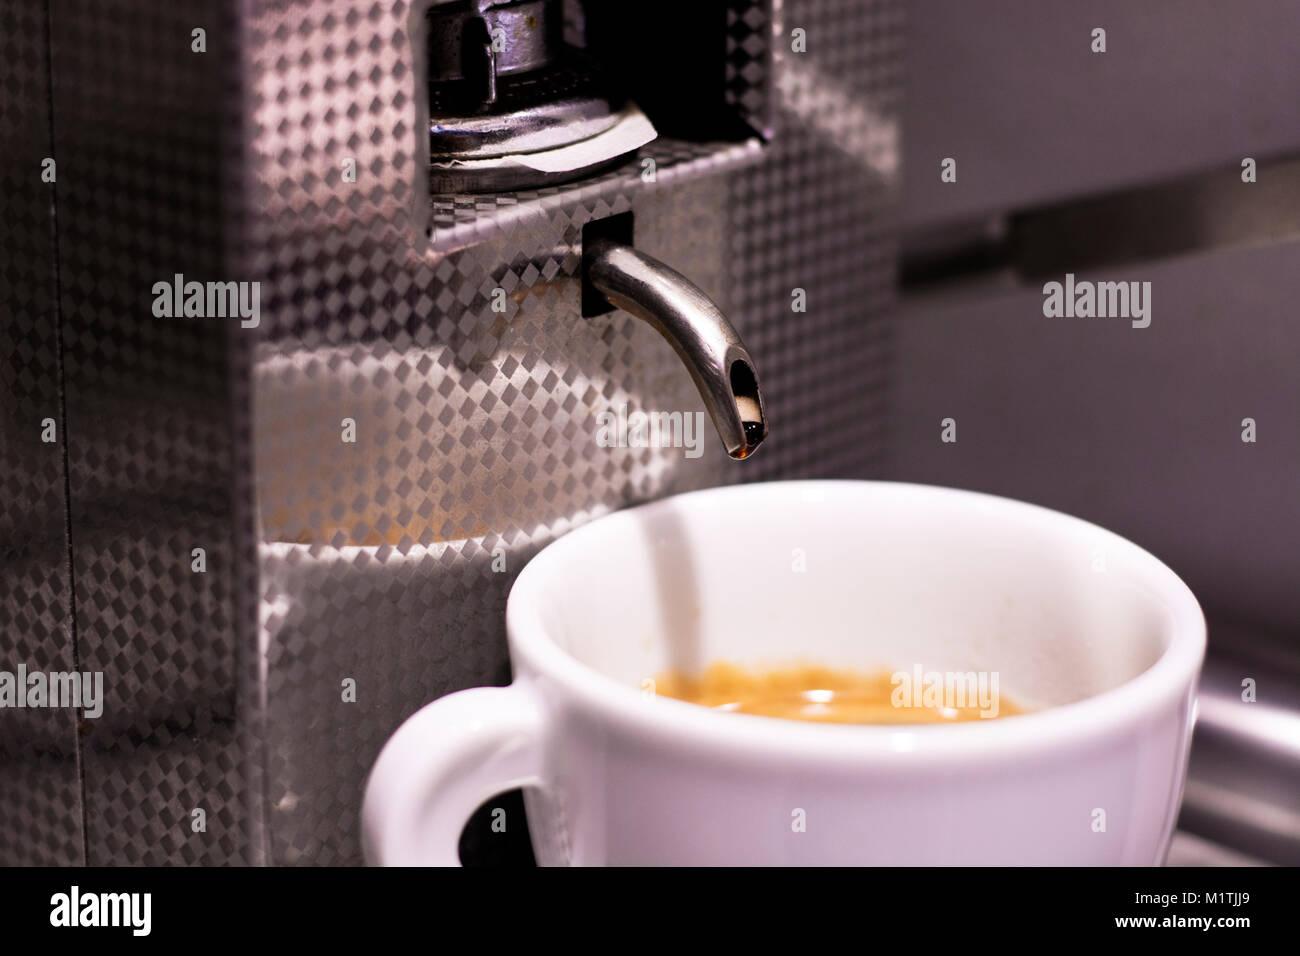 Homemade fresh espresso in white coffee cup - Stock Image